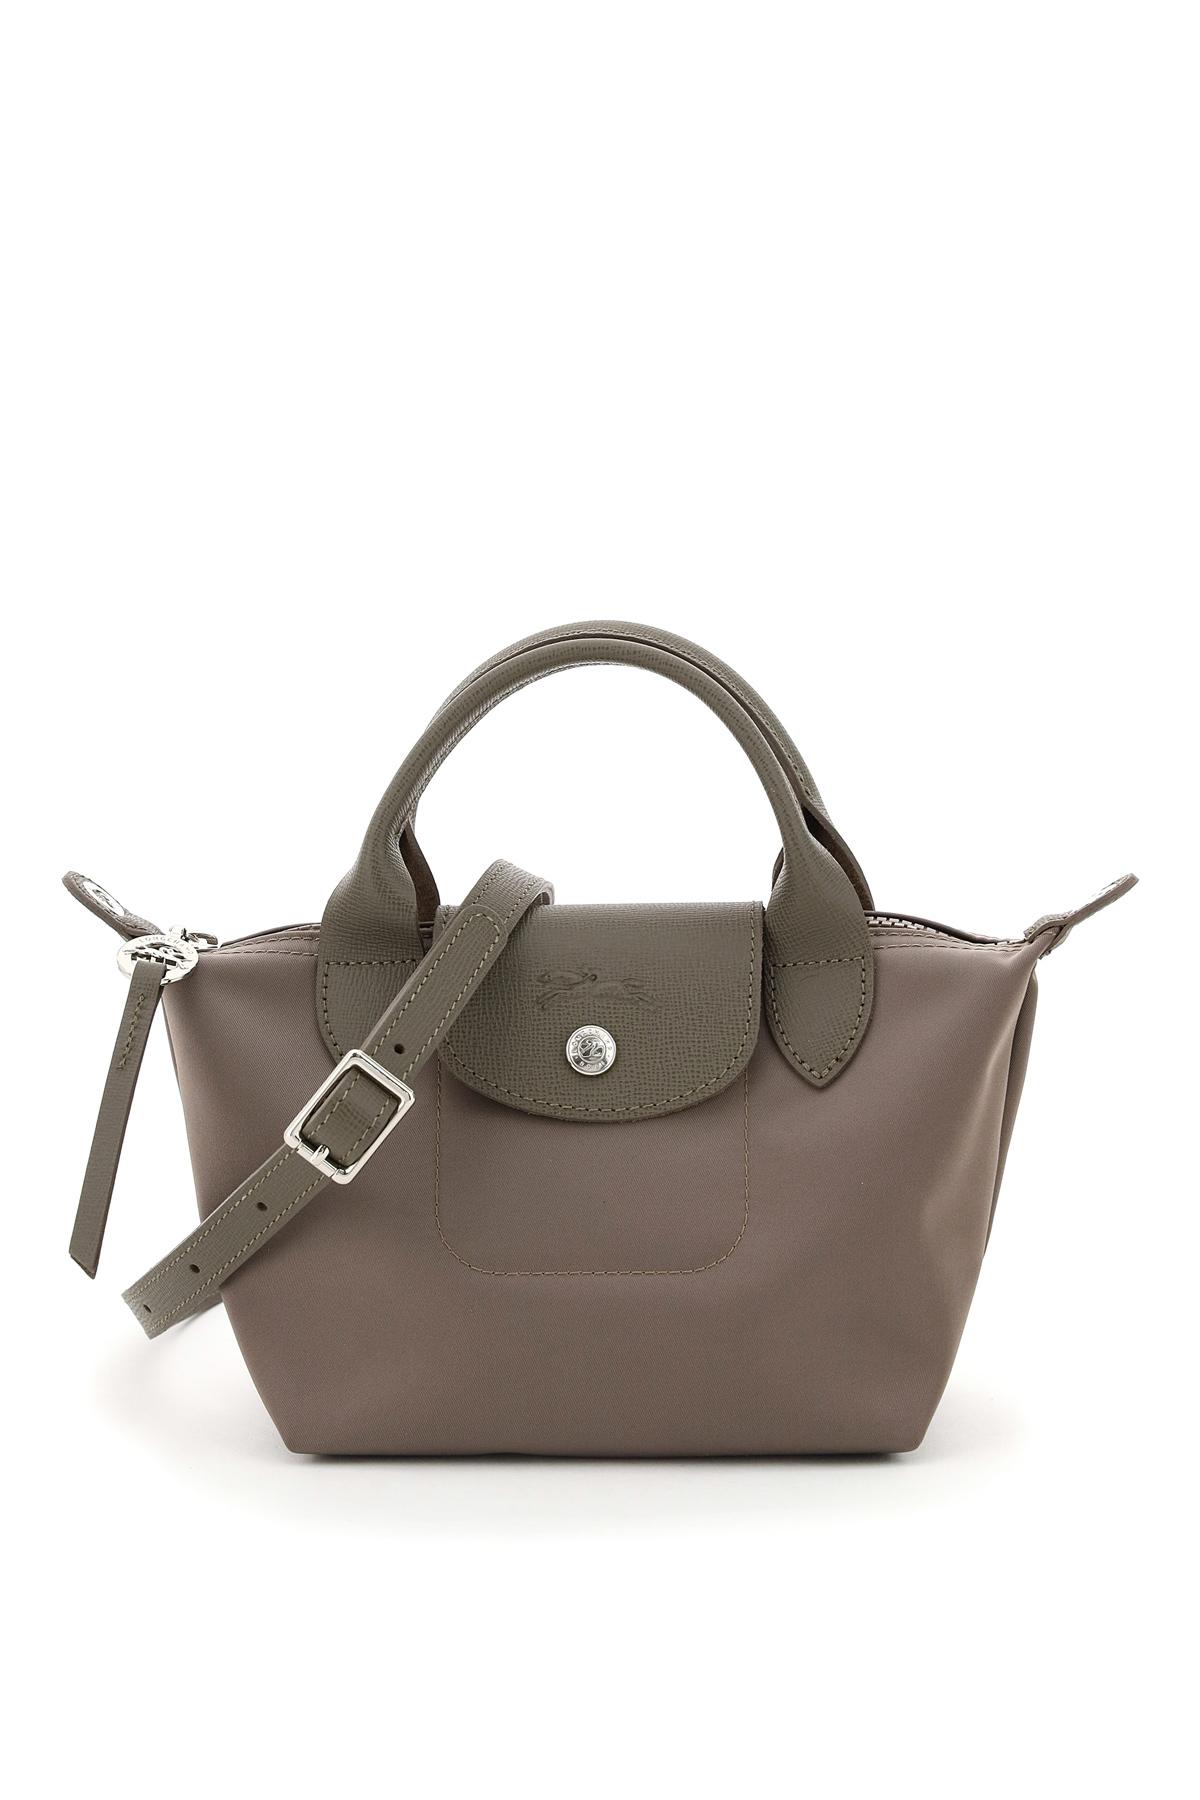 Longchamp shopping le pliage néo mini